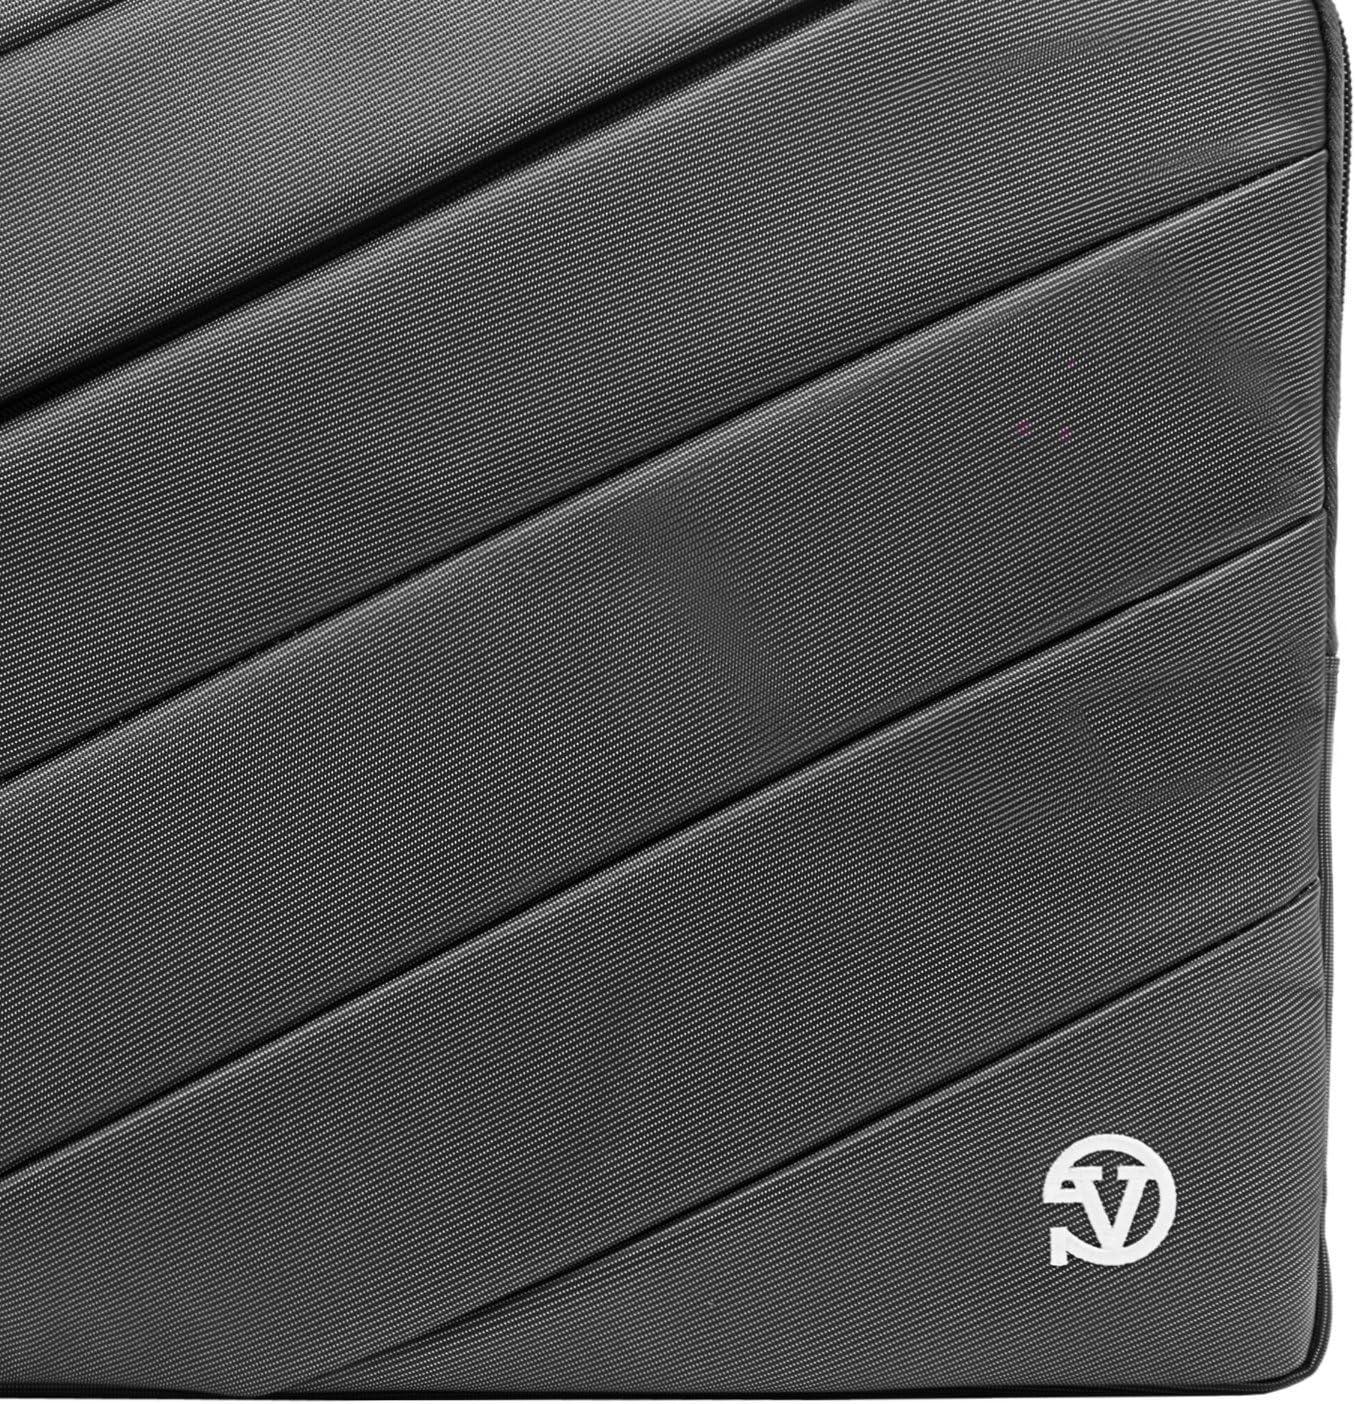 Amazon.com: Vangoddy 12in Sleeve for, Lenovo Yoga Book C930 ...